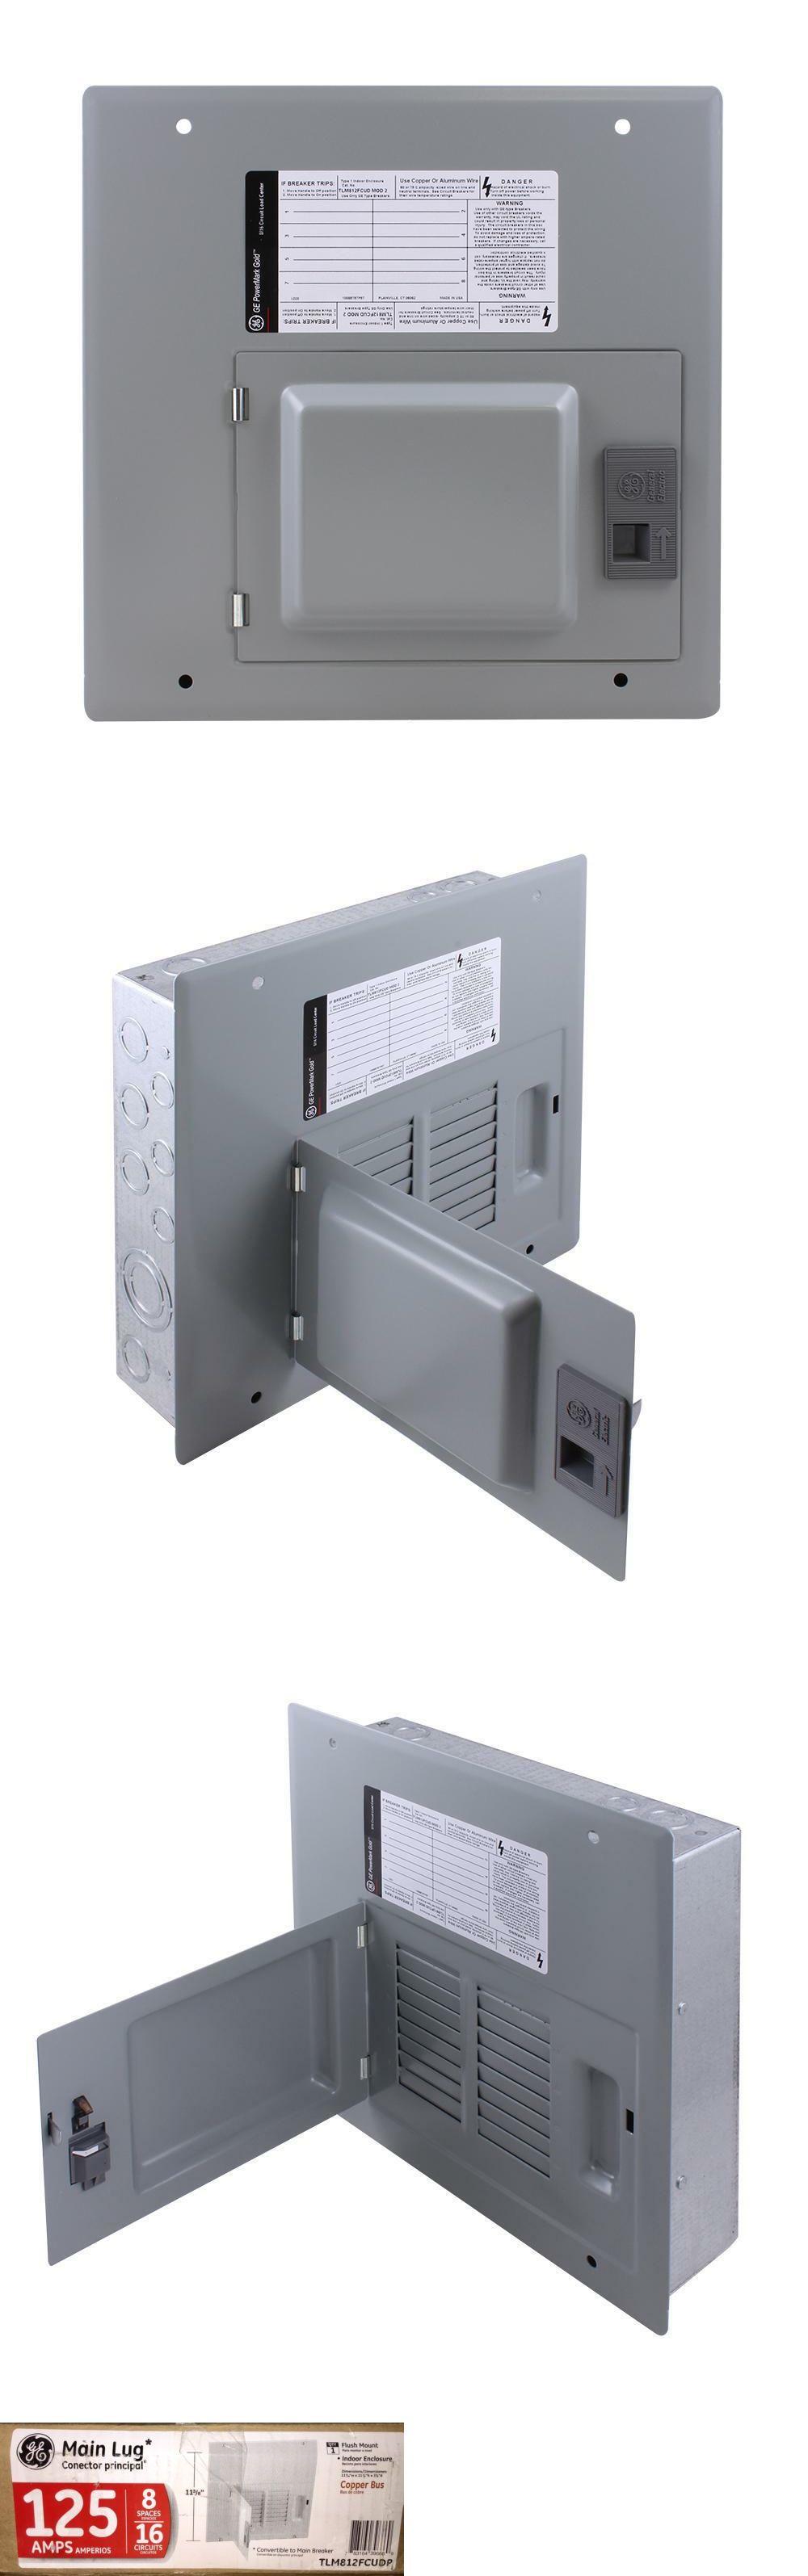 medium resolution of 125 amp fuse box wiring diagram centre125 amp fuse box manual e bookcircuit breakers and fuse